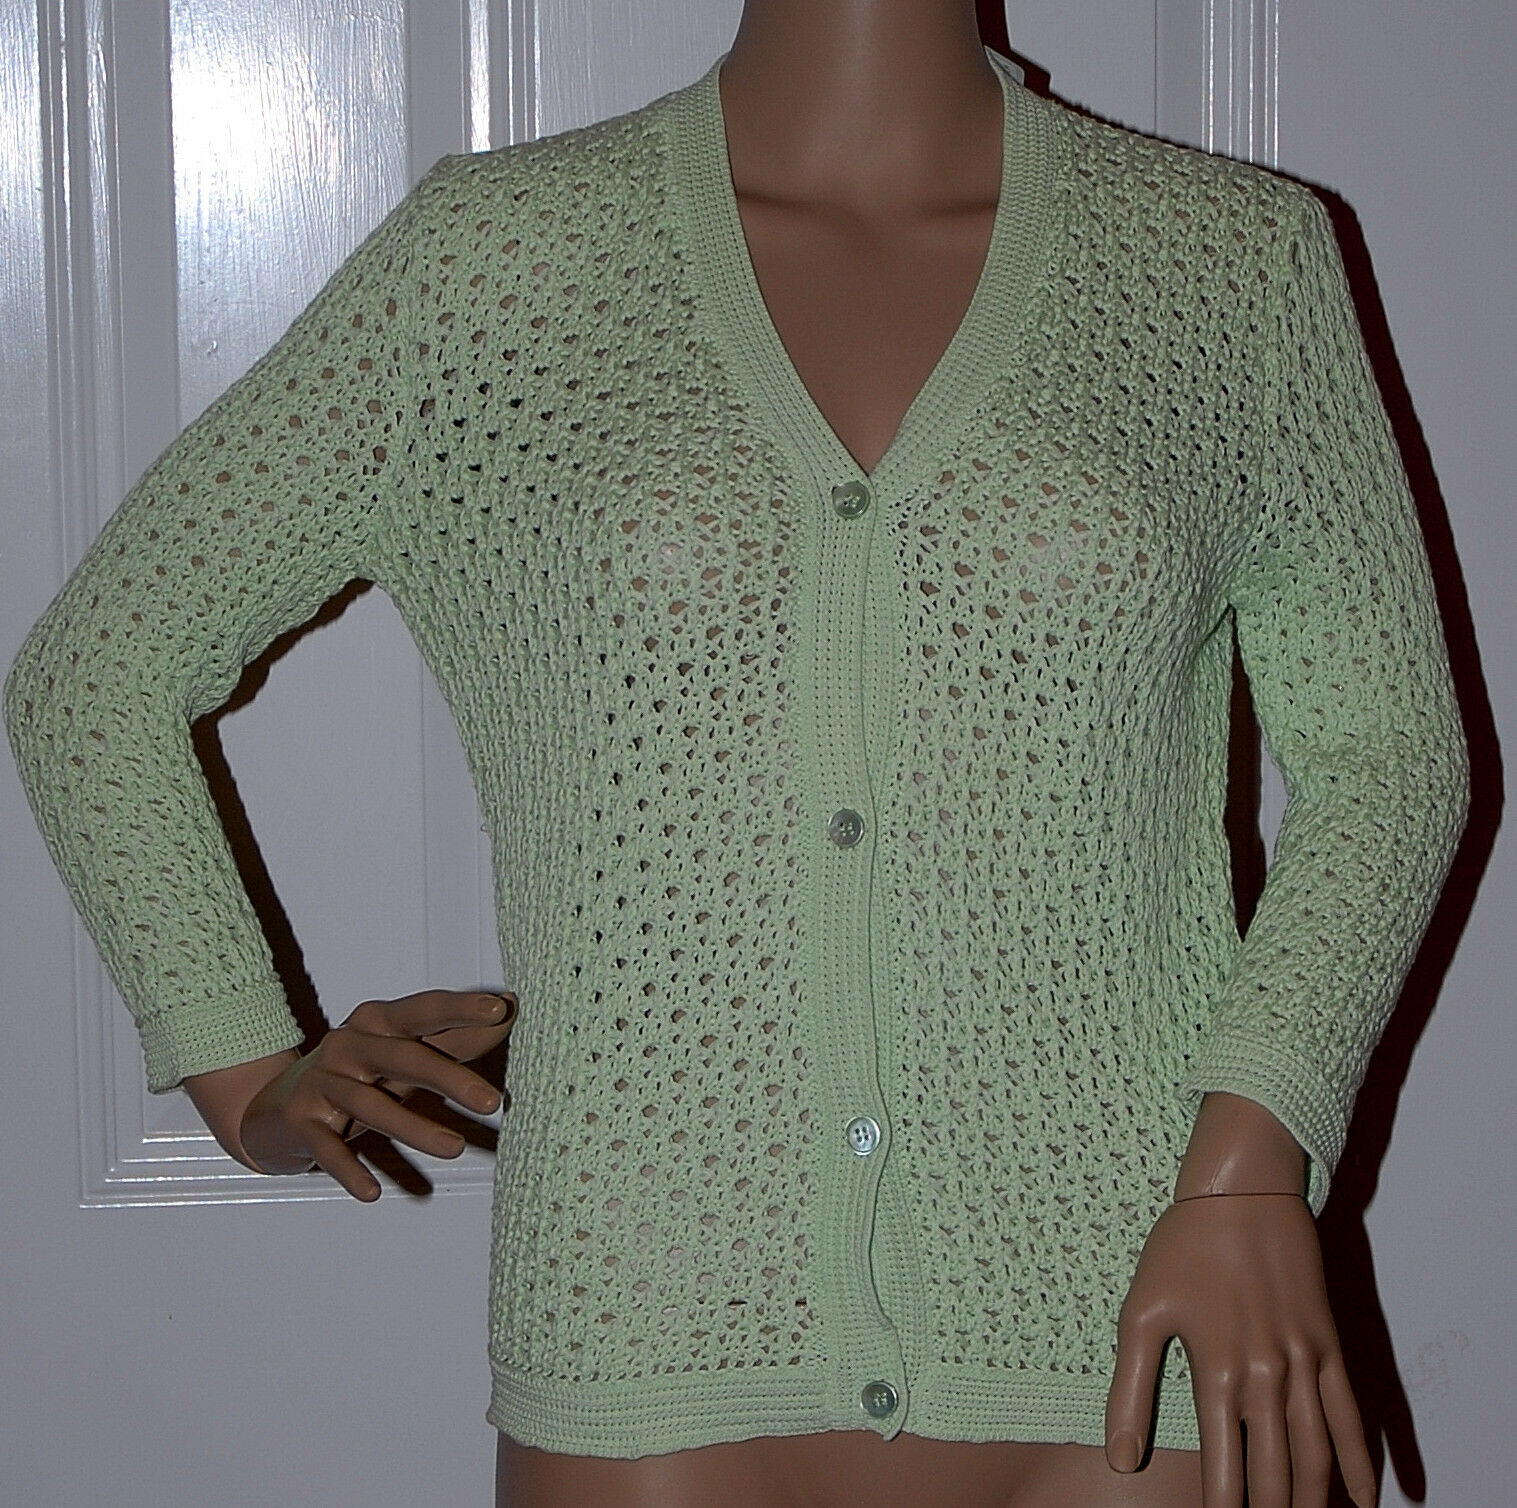 New  1270.00 Jil Sander Mint Green Cardigan Sweater NWT NWT NWT Luxury 36 Made in  4608c4